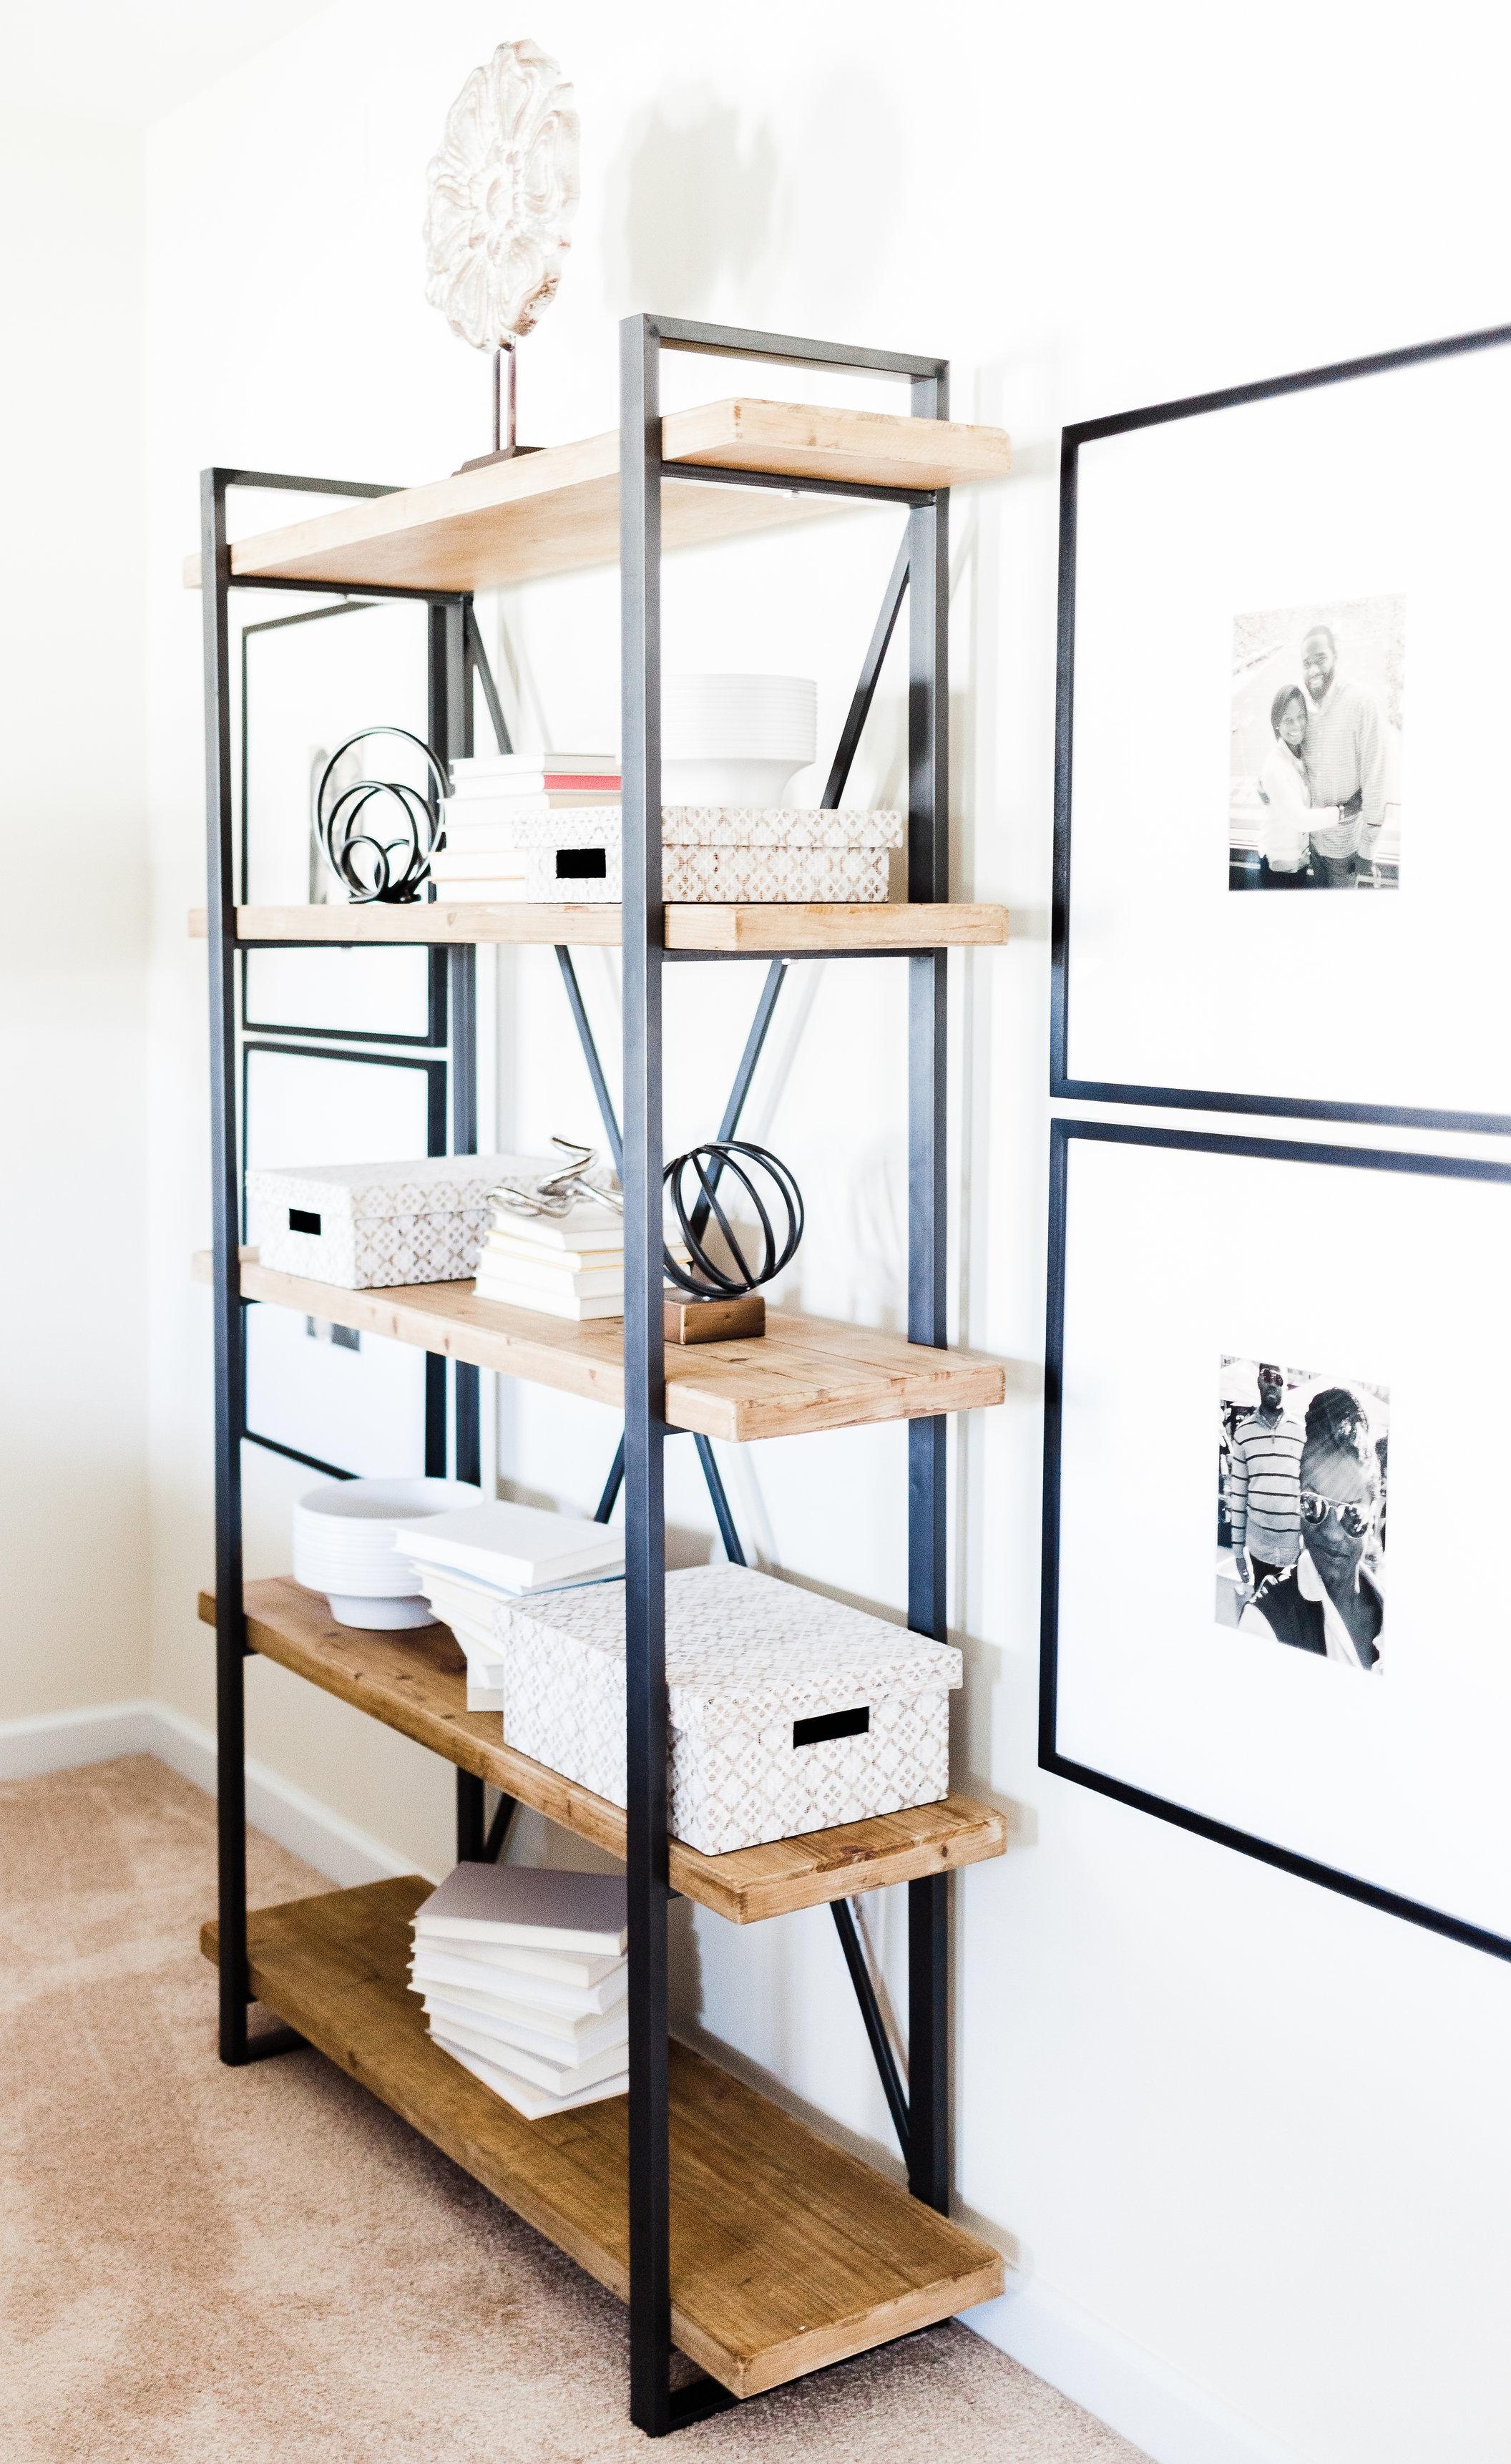 Niki McNeill Raleigh Apex Greenville NC Interior Designer SingleBubblePop Design Studio